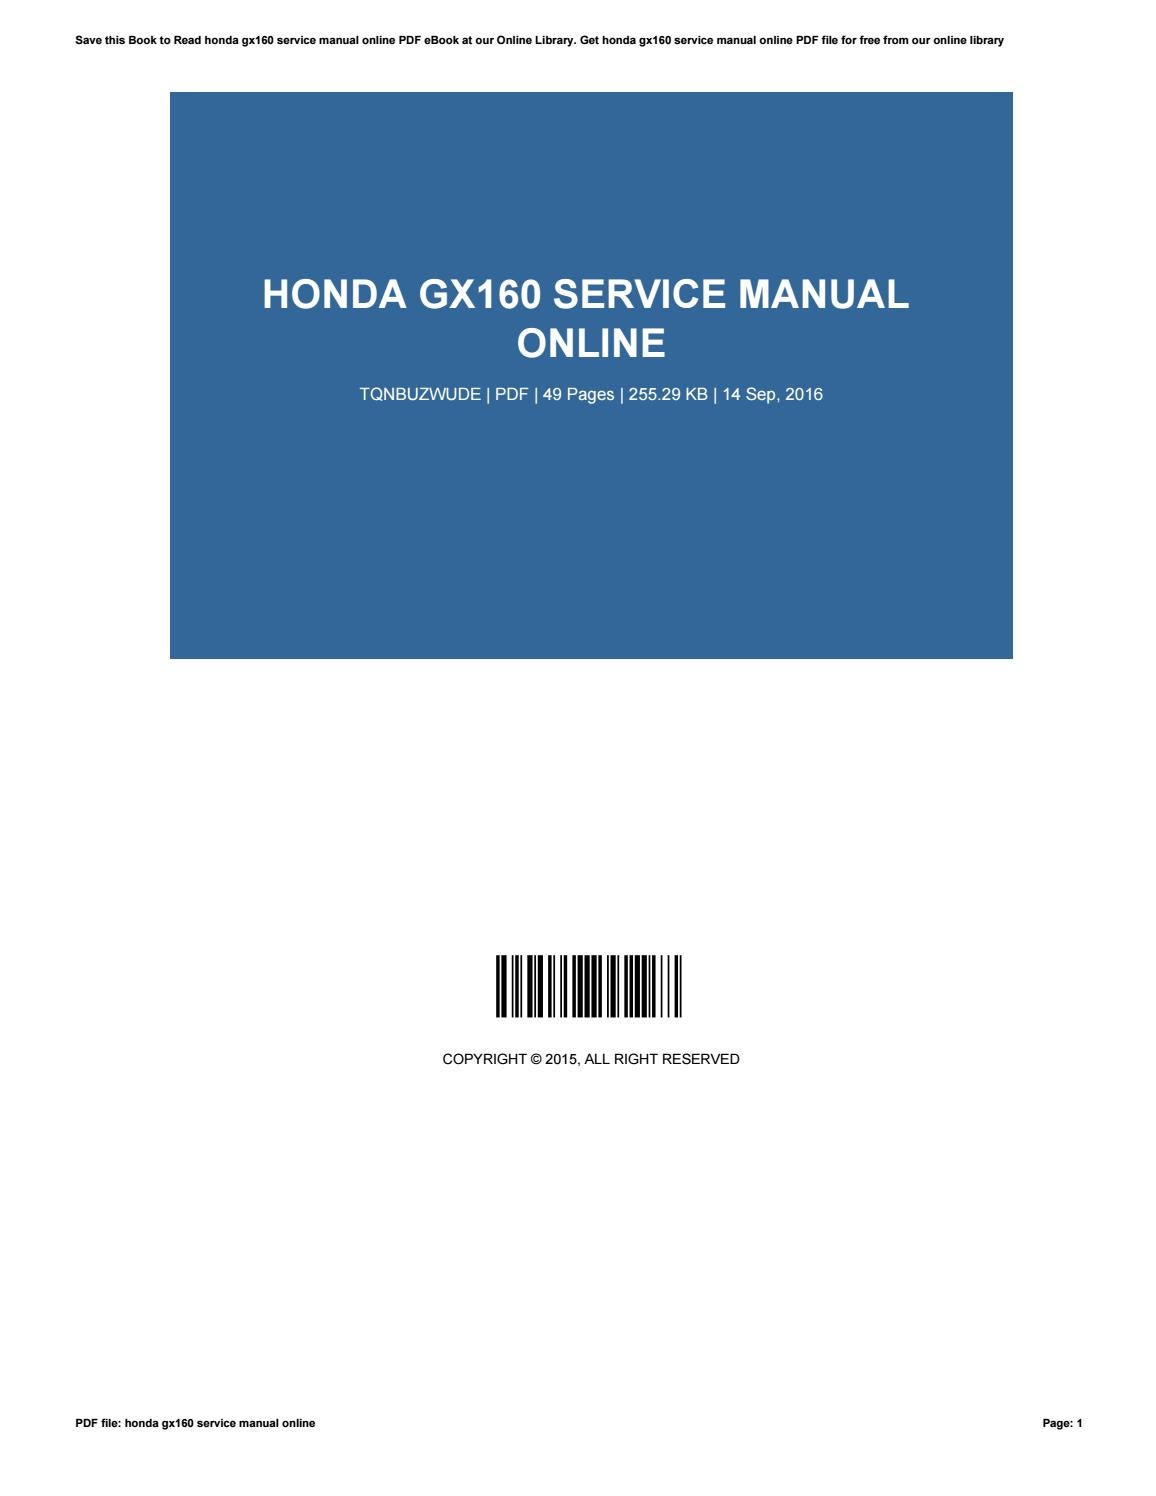 Honda Gx 120 Service Manual Yamaha Zeal Wiring Diagram Array Gx120 Pdf Www Topsimages Com Rh